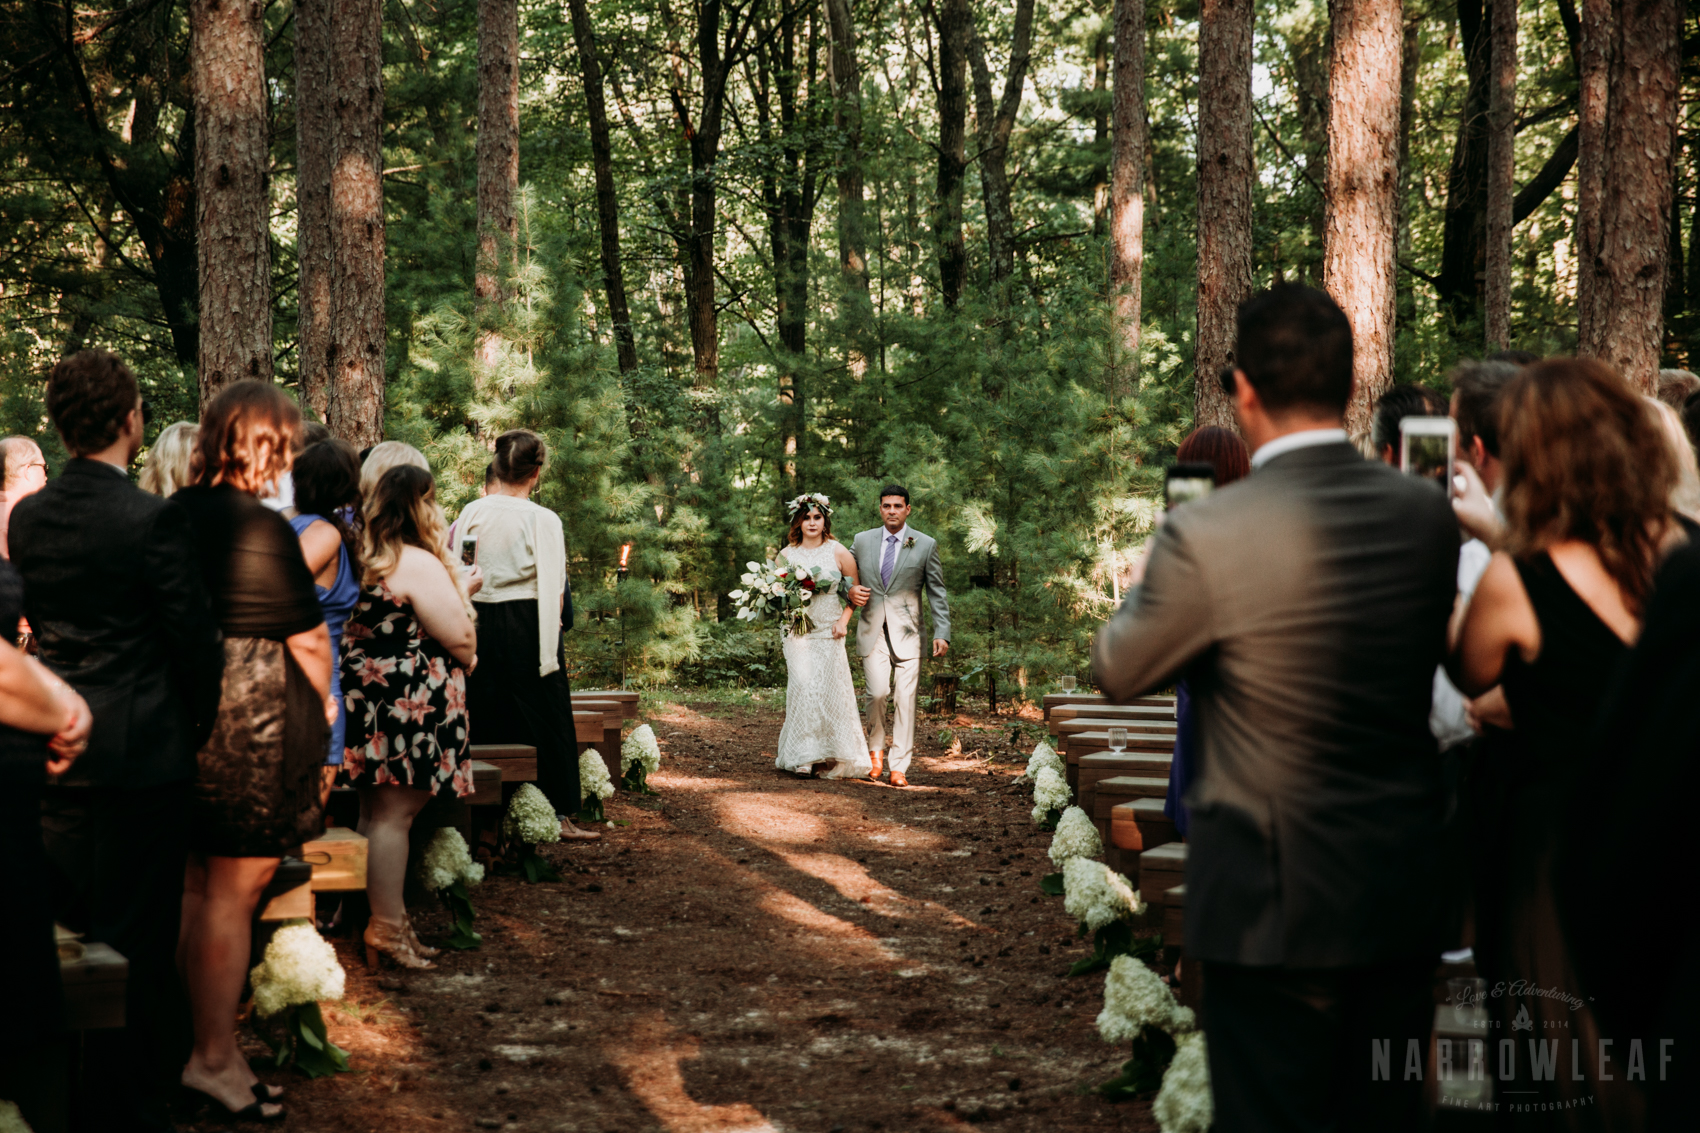 woodsy-boho-wedding-ceremony-burlap-and-bells-wi-NarrowLeaf_Love_&_Adventure_Photography-5.jpg